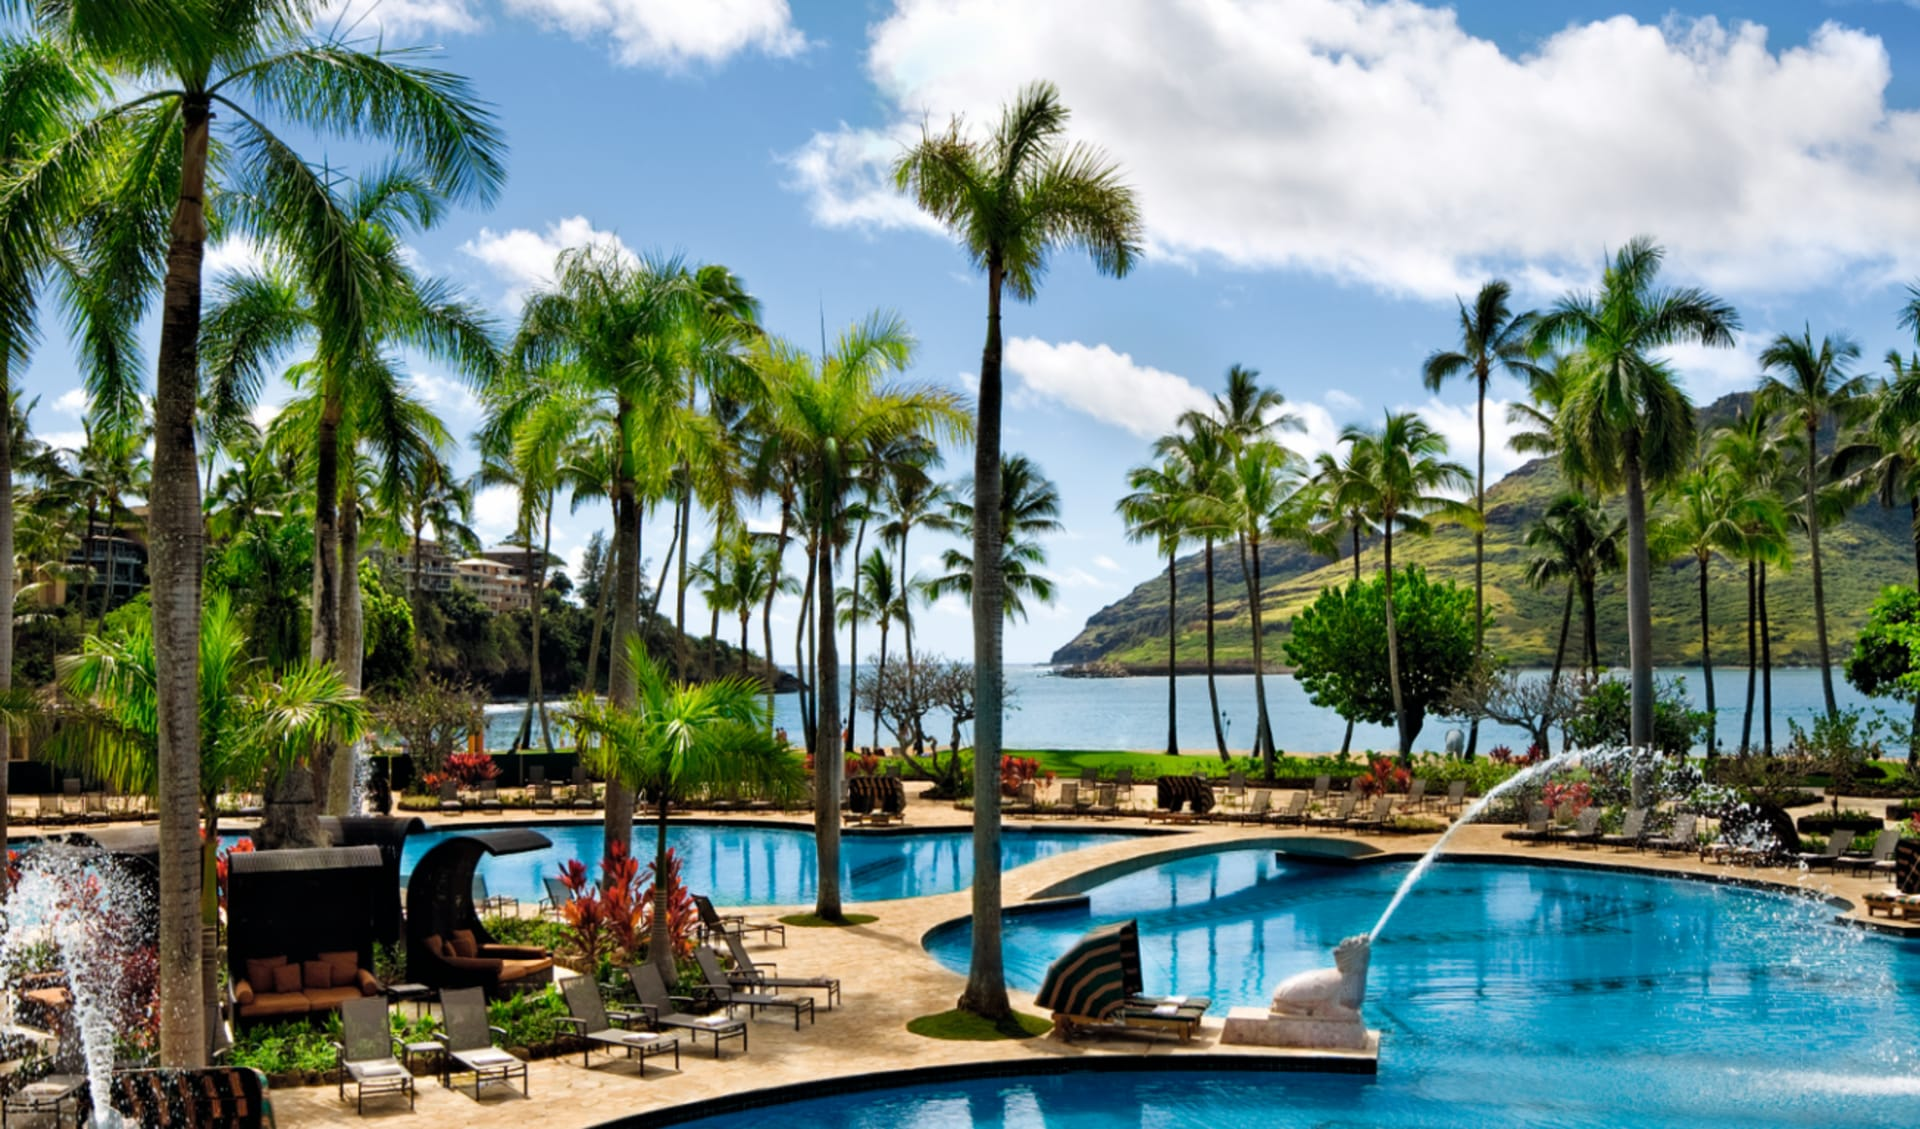 Royal Sonesta Kaua'i Resort Lihue in Lihue - Kauai: pool kauai marriott on kalapaki beach poolanlage liegen palmen meer